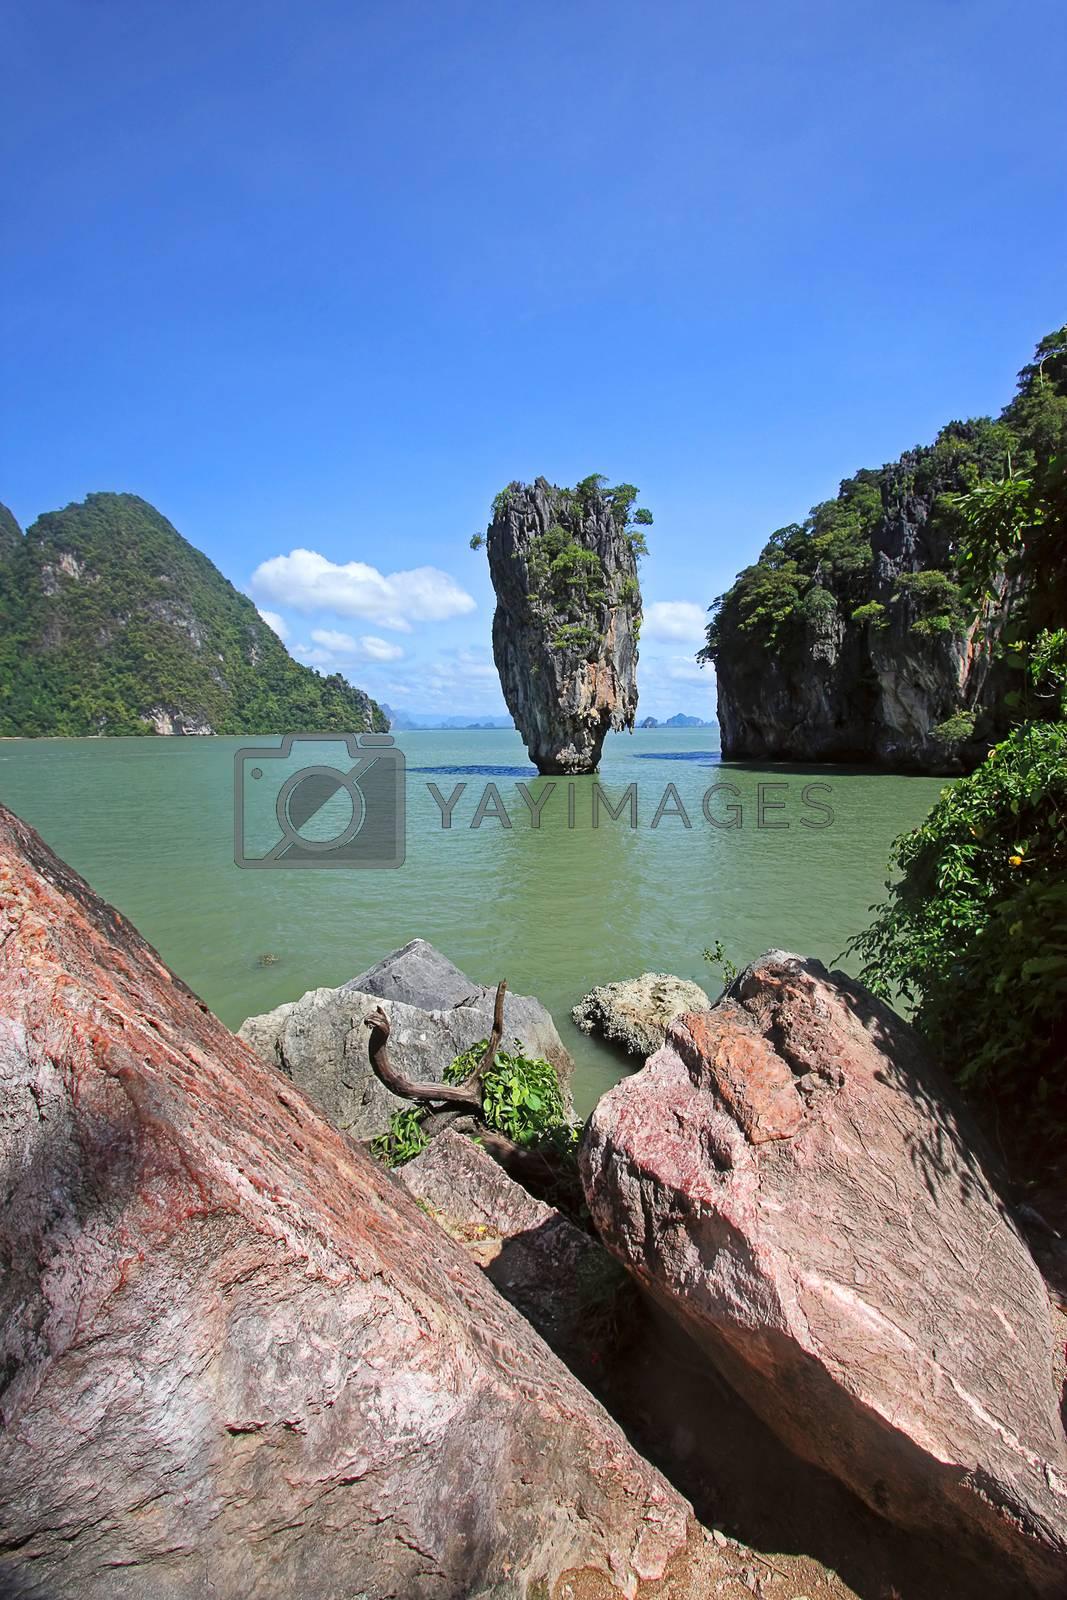 Royalty free image of James Bond Island by zhannaprokopeva